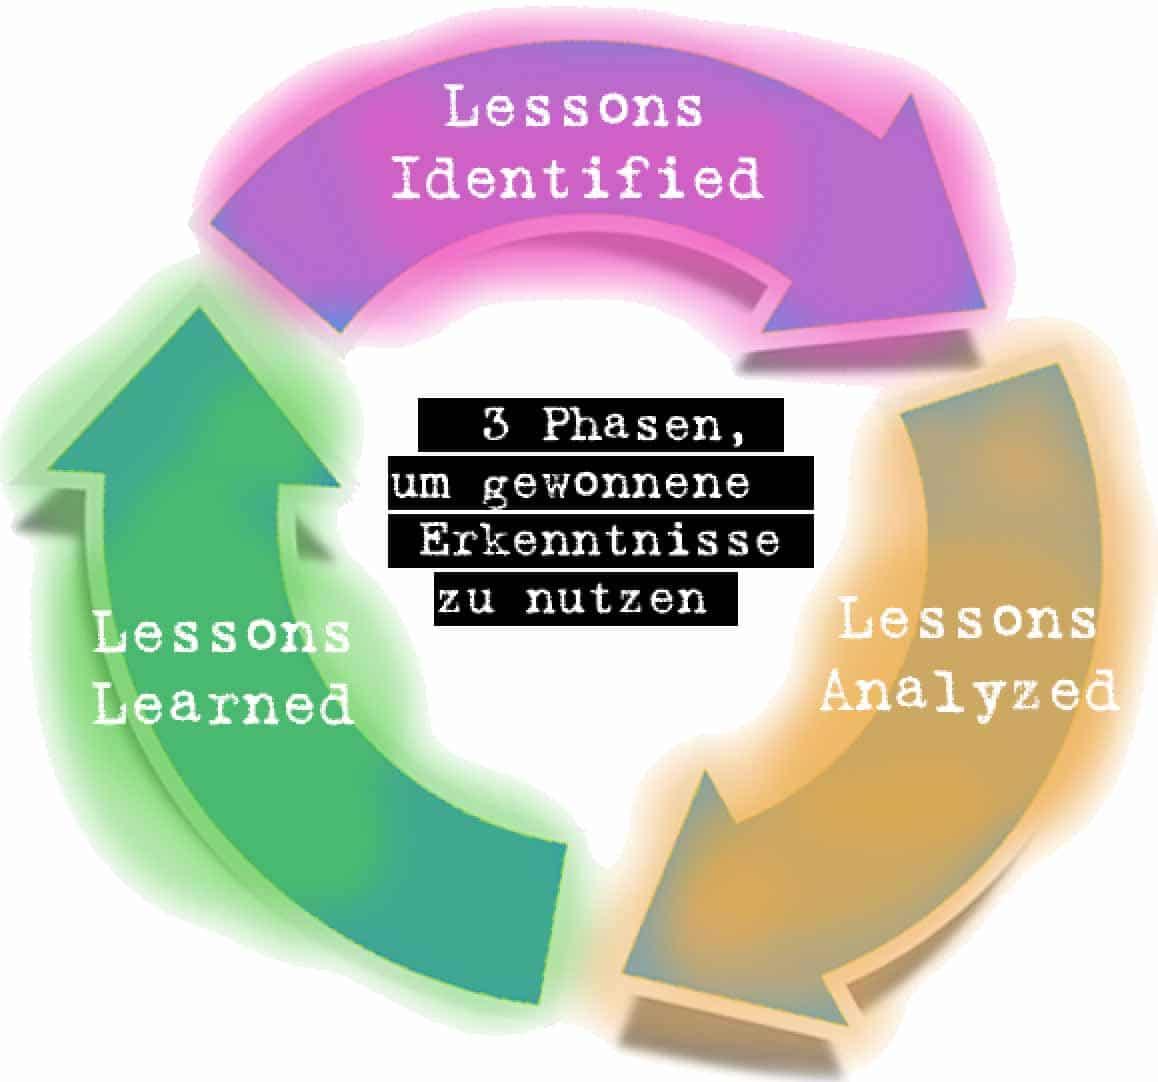 Lessons Learned - Erkenntnisse gewinnen in drei Phasen